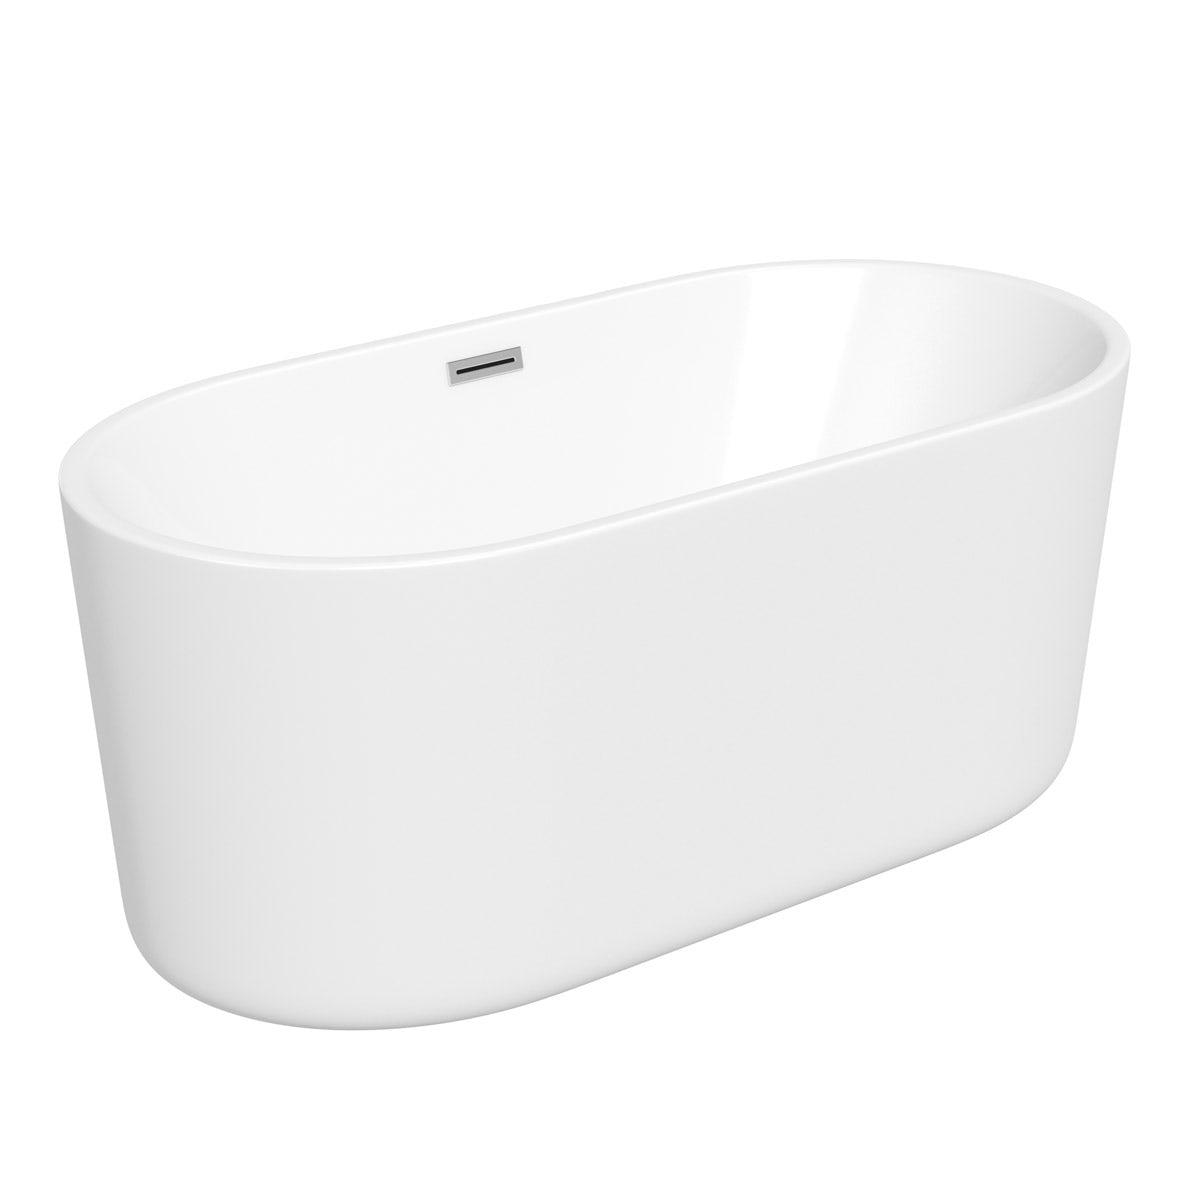 Mode Tate freestanding bath